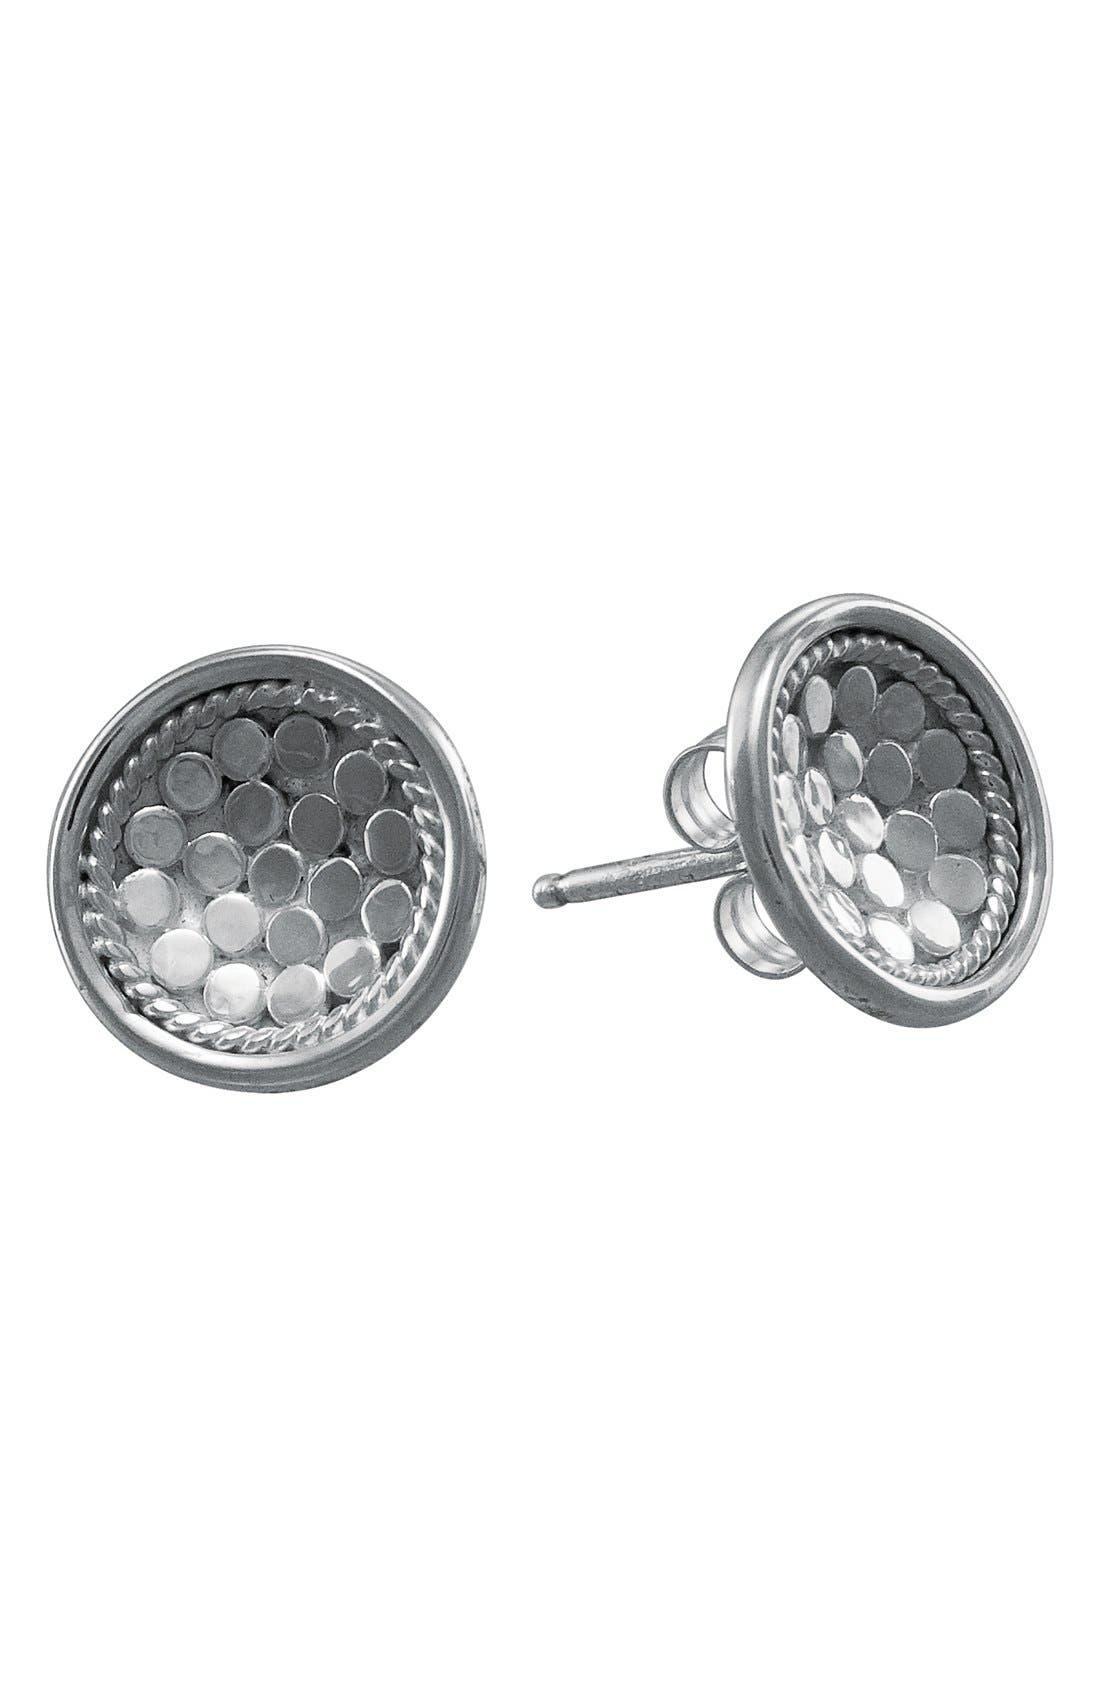 Alternate Image 1 Selected - Anna Beck 'Gili' Small Dish Stud Earrings